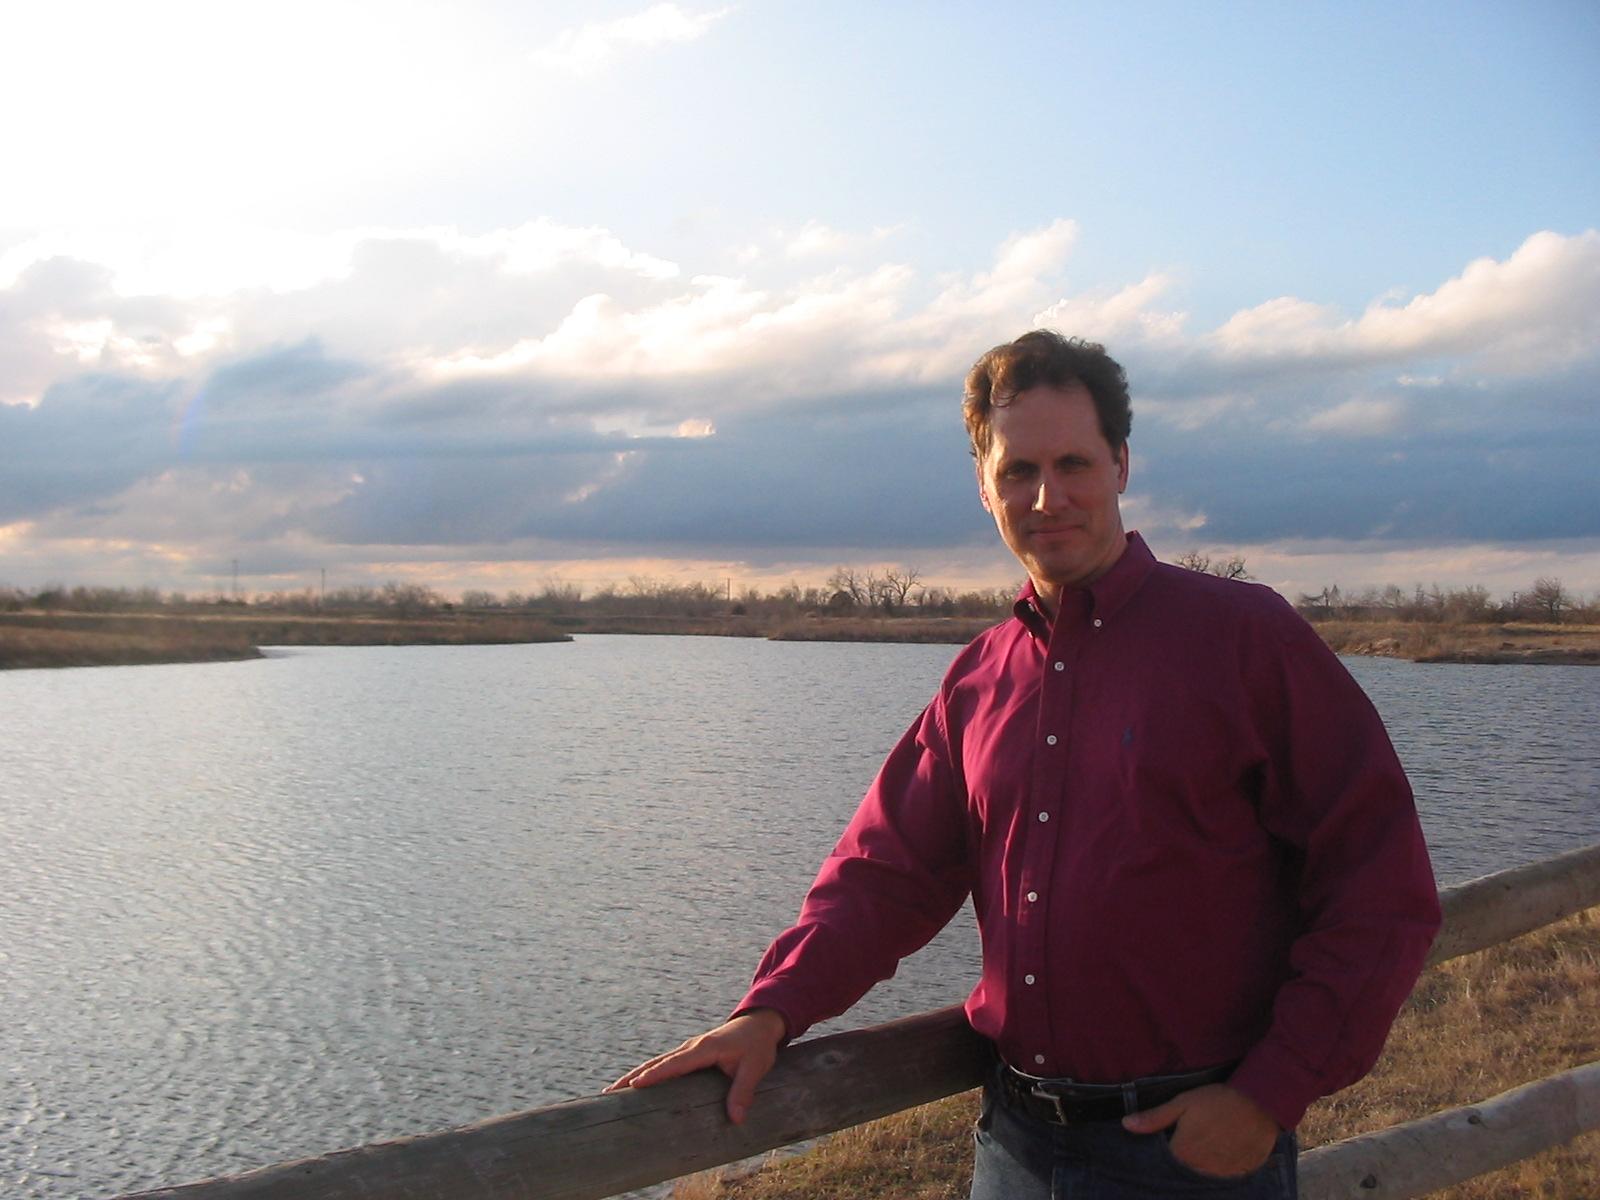 Jim on the Platte